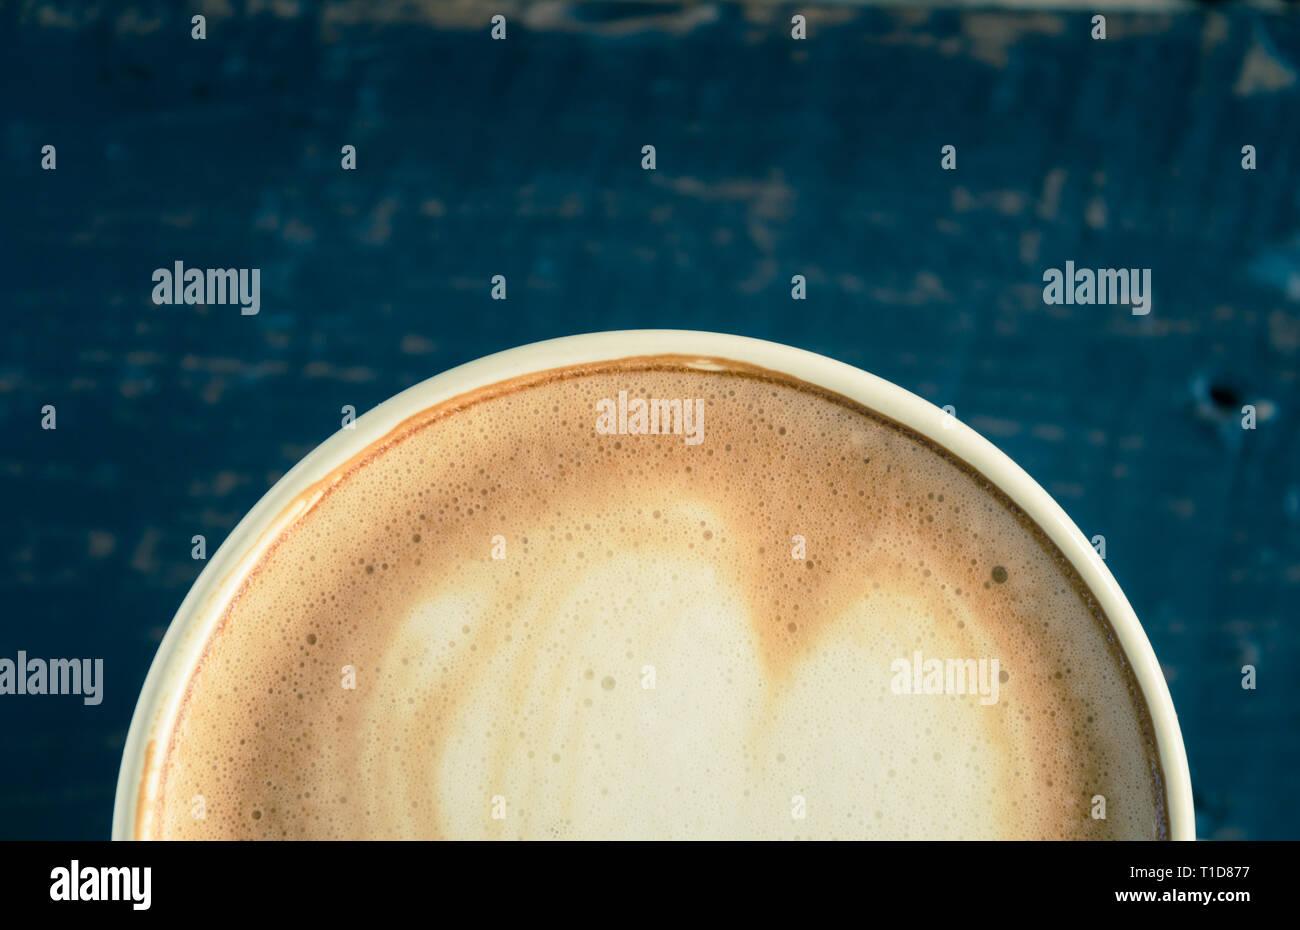 Bottom Fo Stock Photos & Bottom Fo Stock Images - Alamy